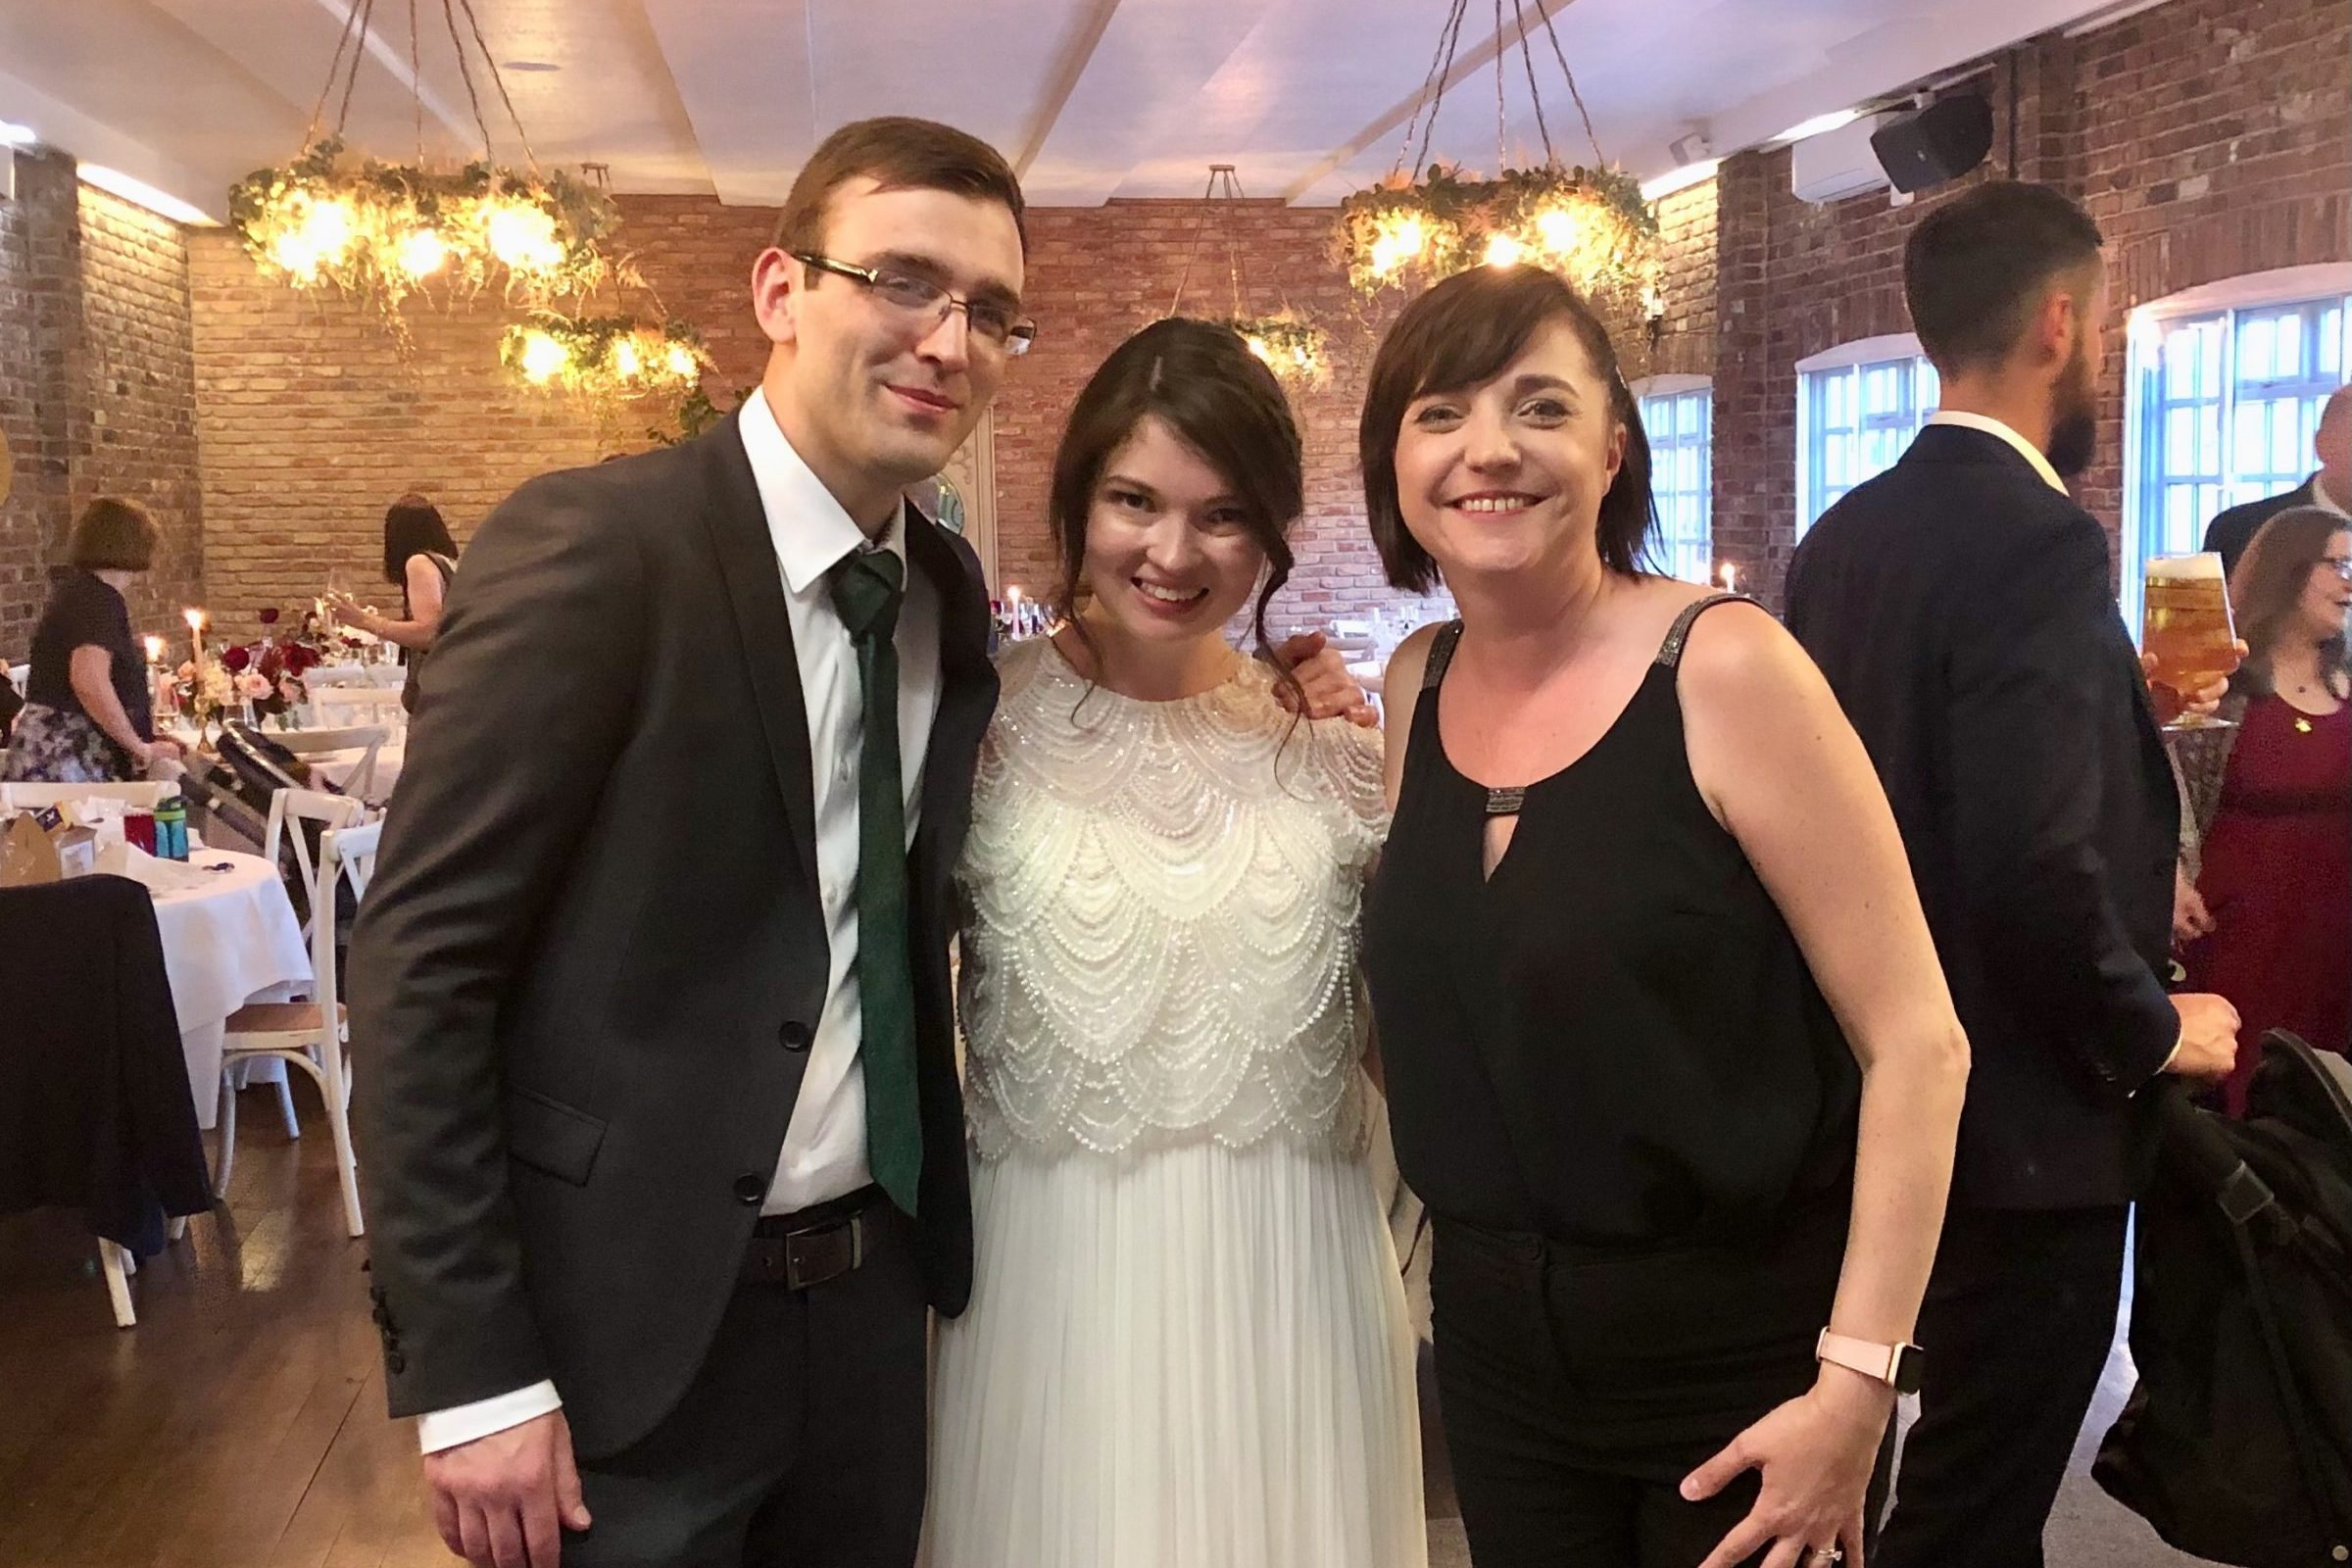 Liz Hendry Wedding Pianist with Rachel and Carl at their Larkspur Lodge Wedding